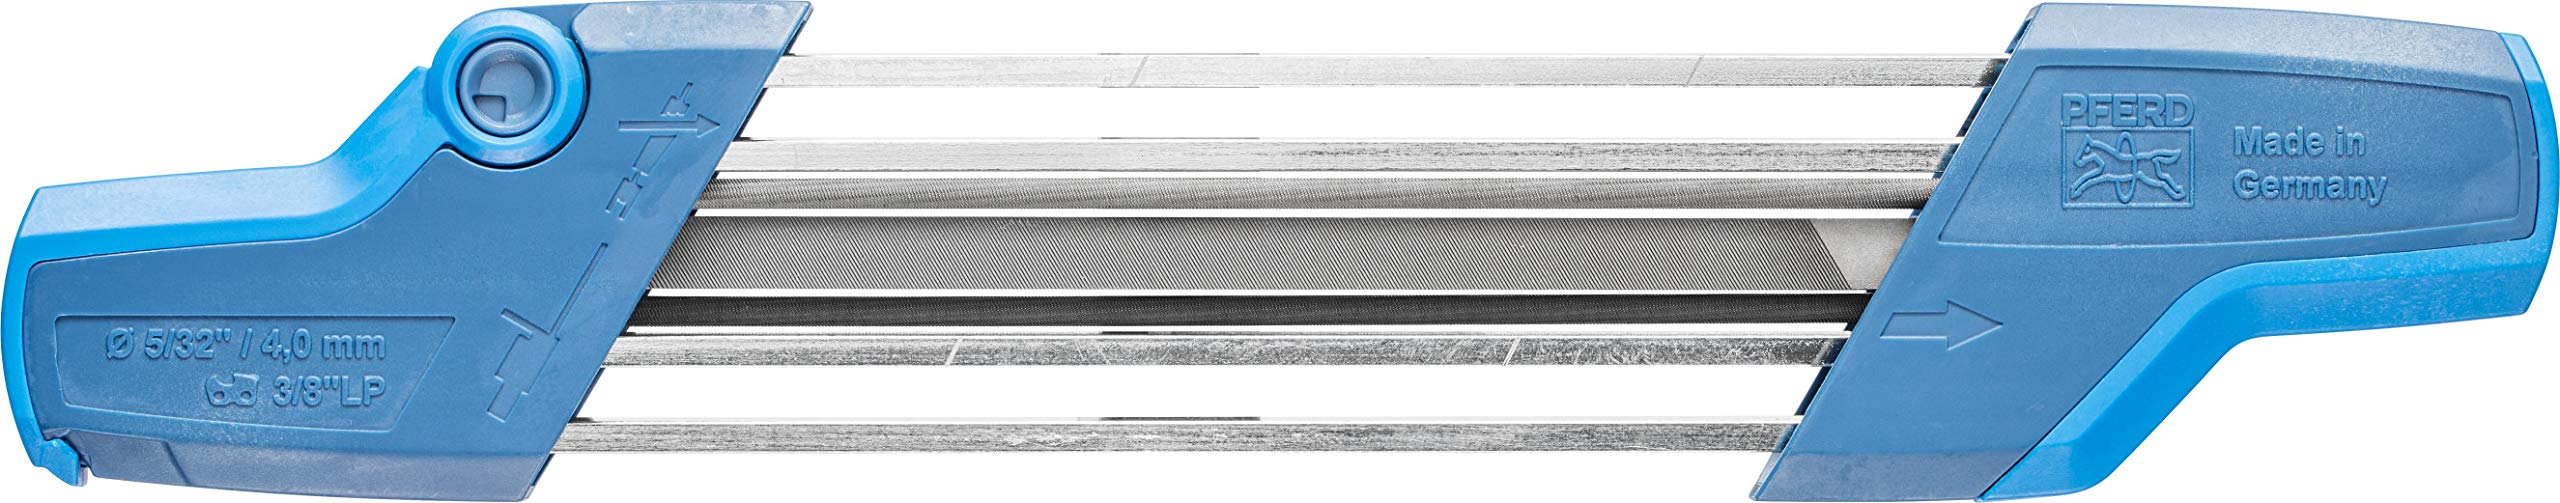 Pferd 17300 CS-X Chain Sharp Filing Guide - 5/32'' by Pferd